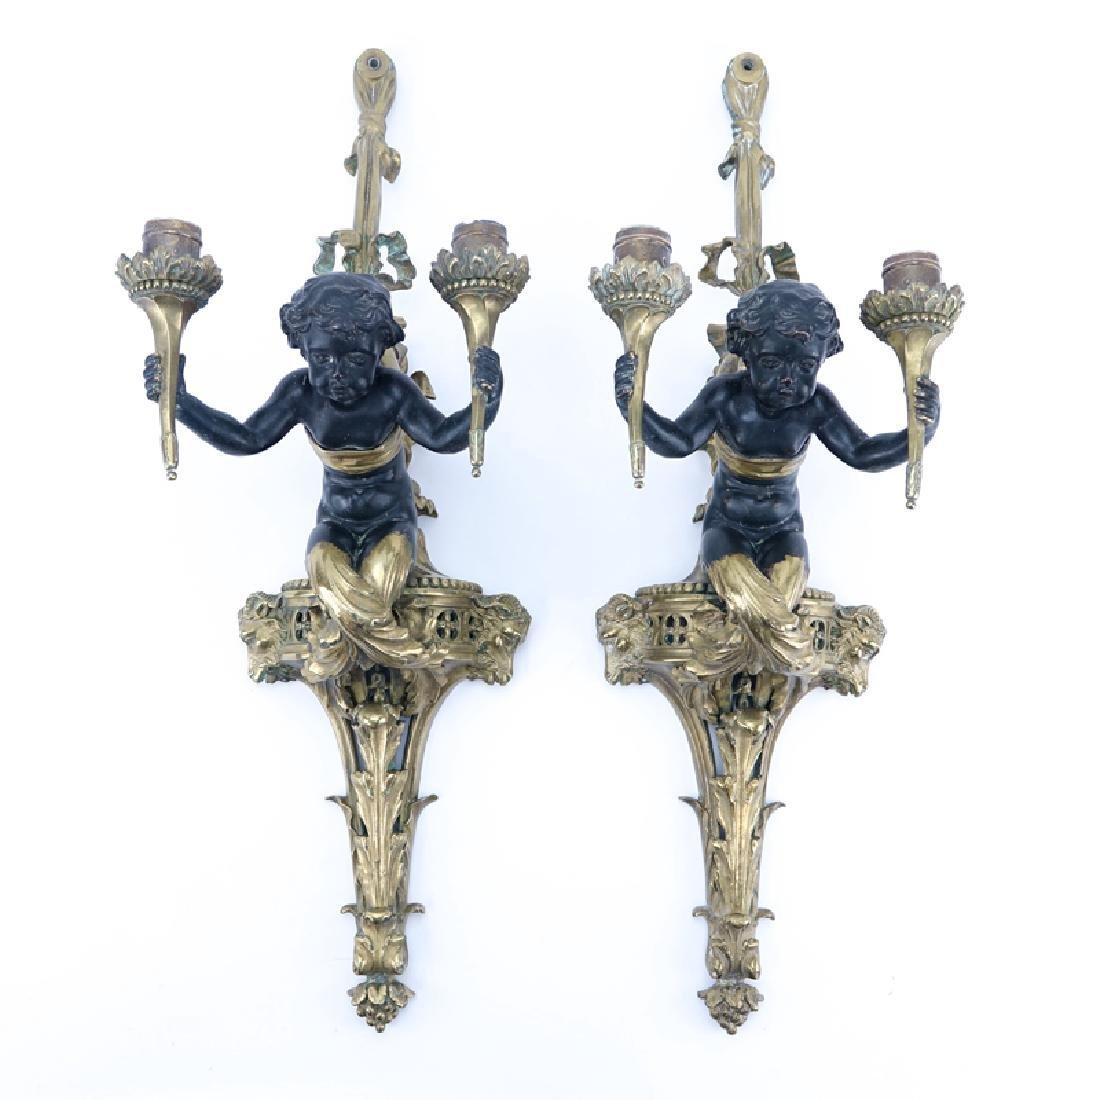 Pair of 19/20th Century Louis XVI Style Gilt Bronze